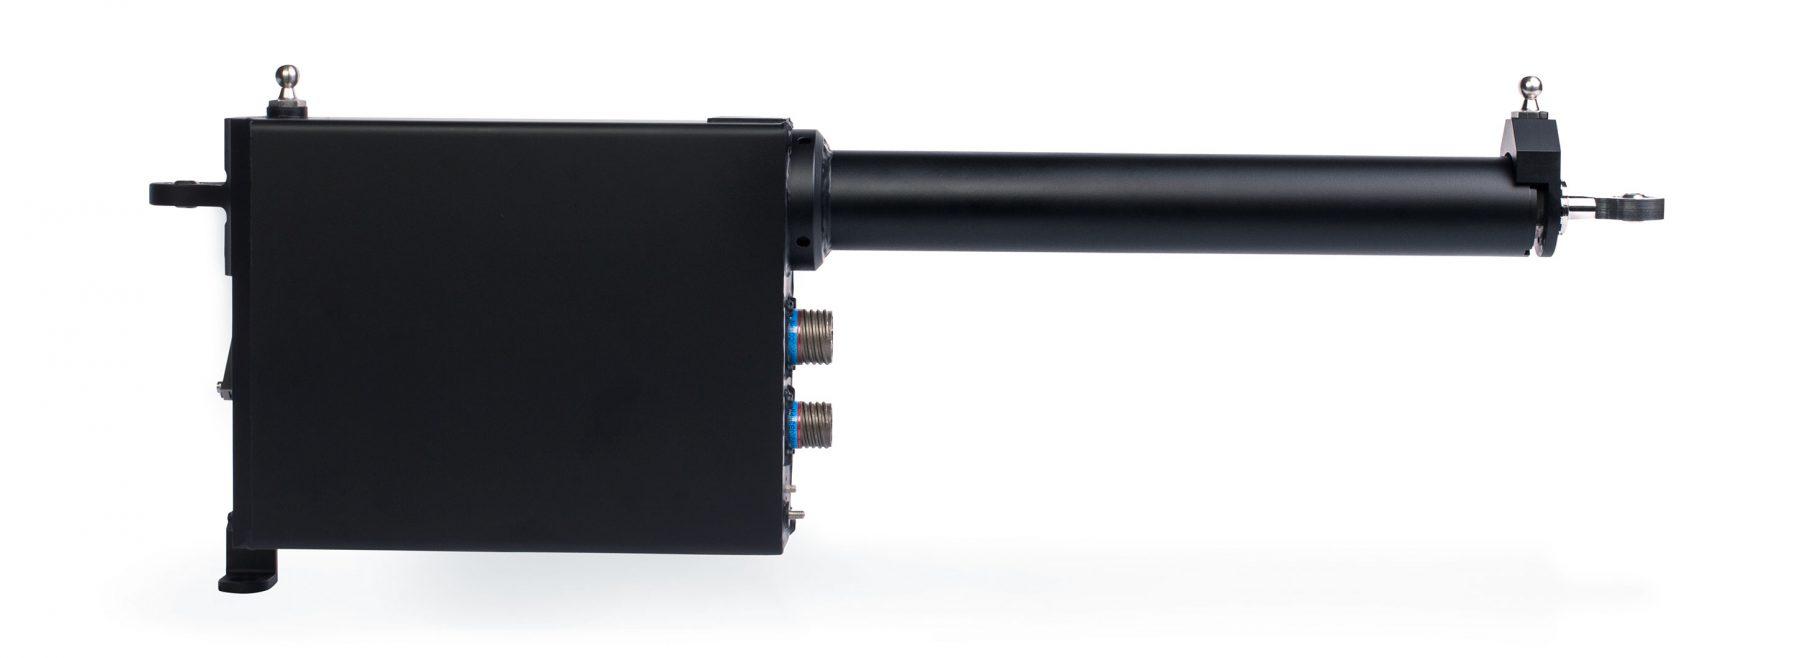 alpha one trim wiring diagram stc 1000 mercruiser starter slave solenoid 502 ...